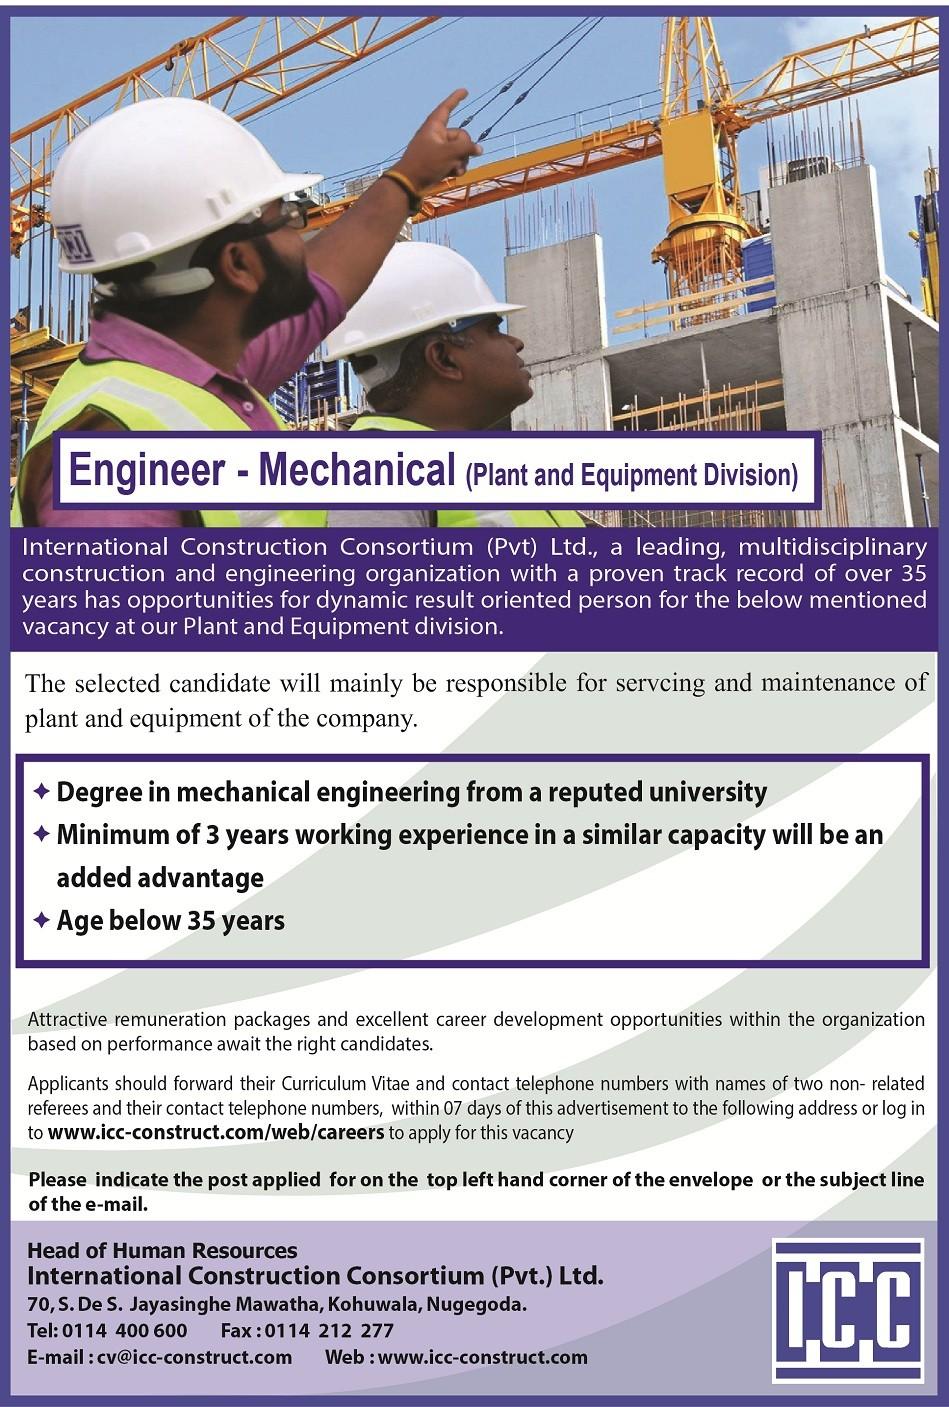 AWVZFDPQutyDvx9 Job Adver Sample For Mechanical Engineer on